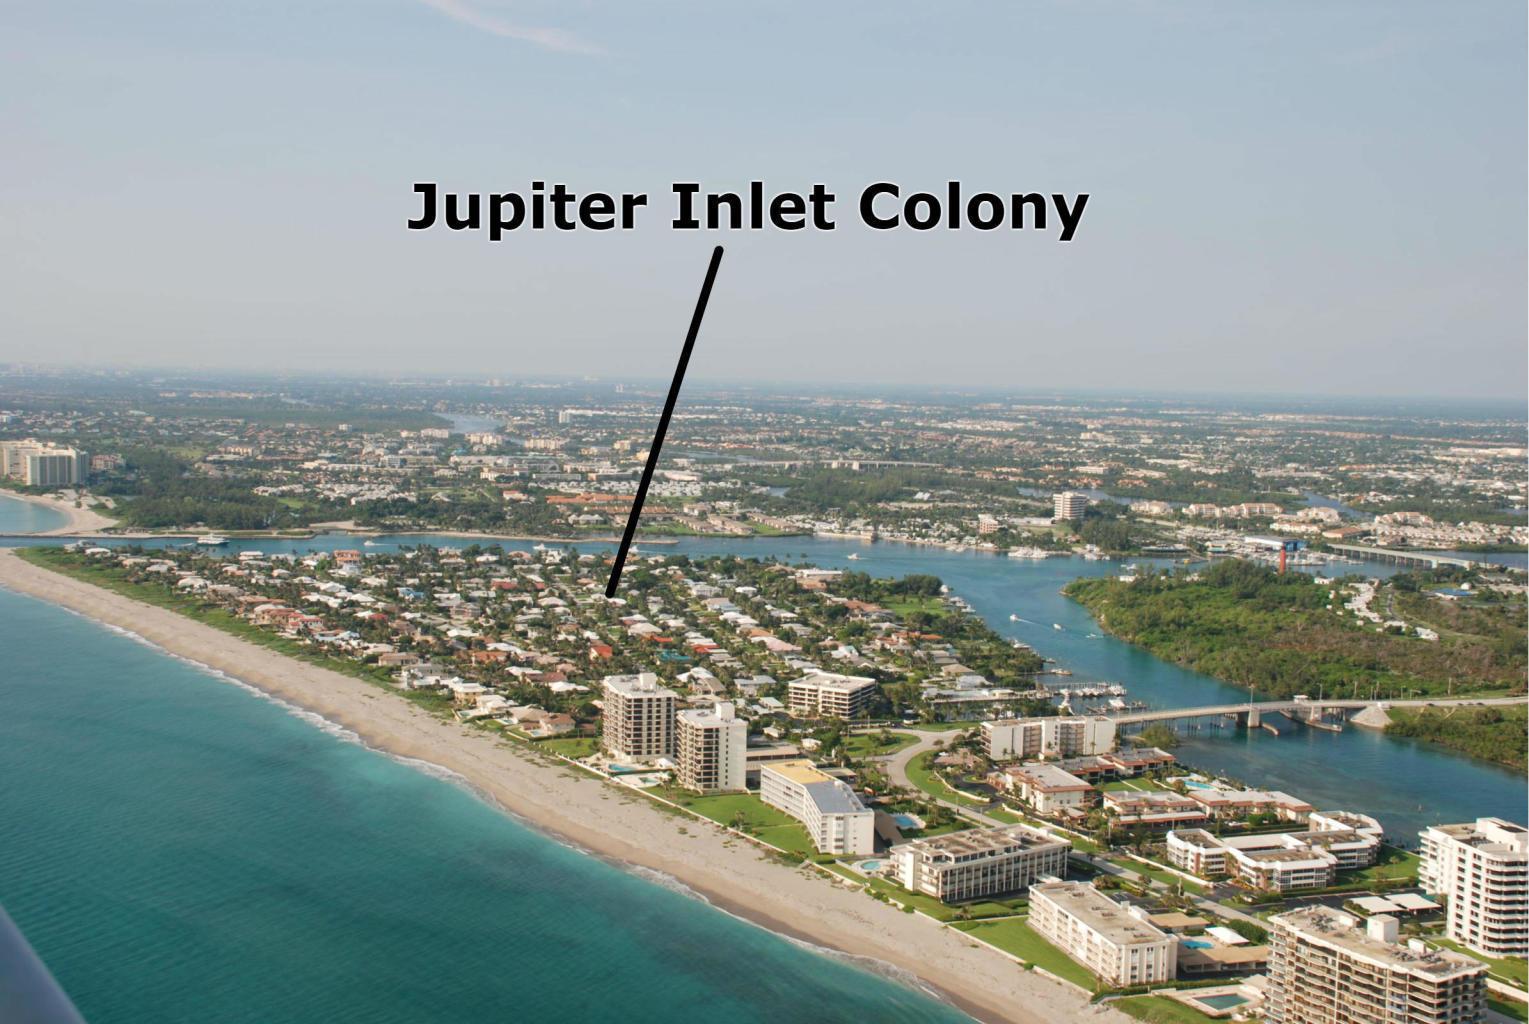 JUPITER INLET COLONY REAL ESTATE